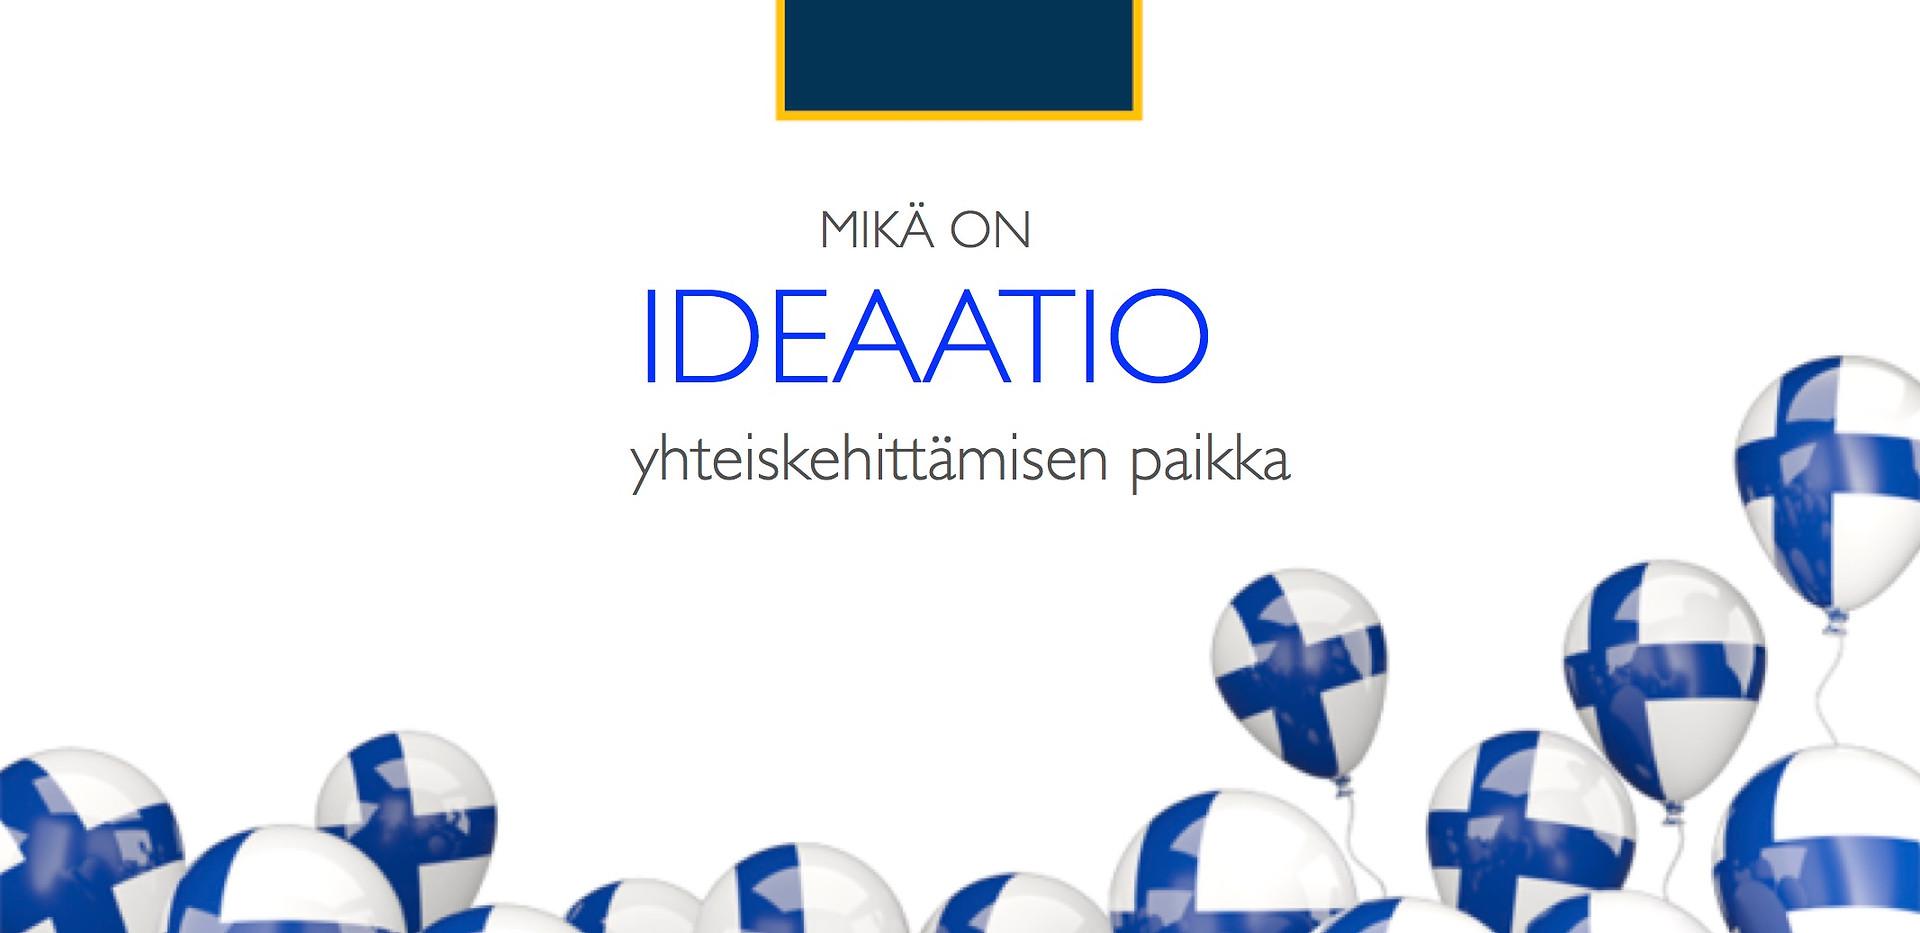 1 OK IDEAATIO.jpg